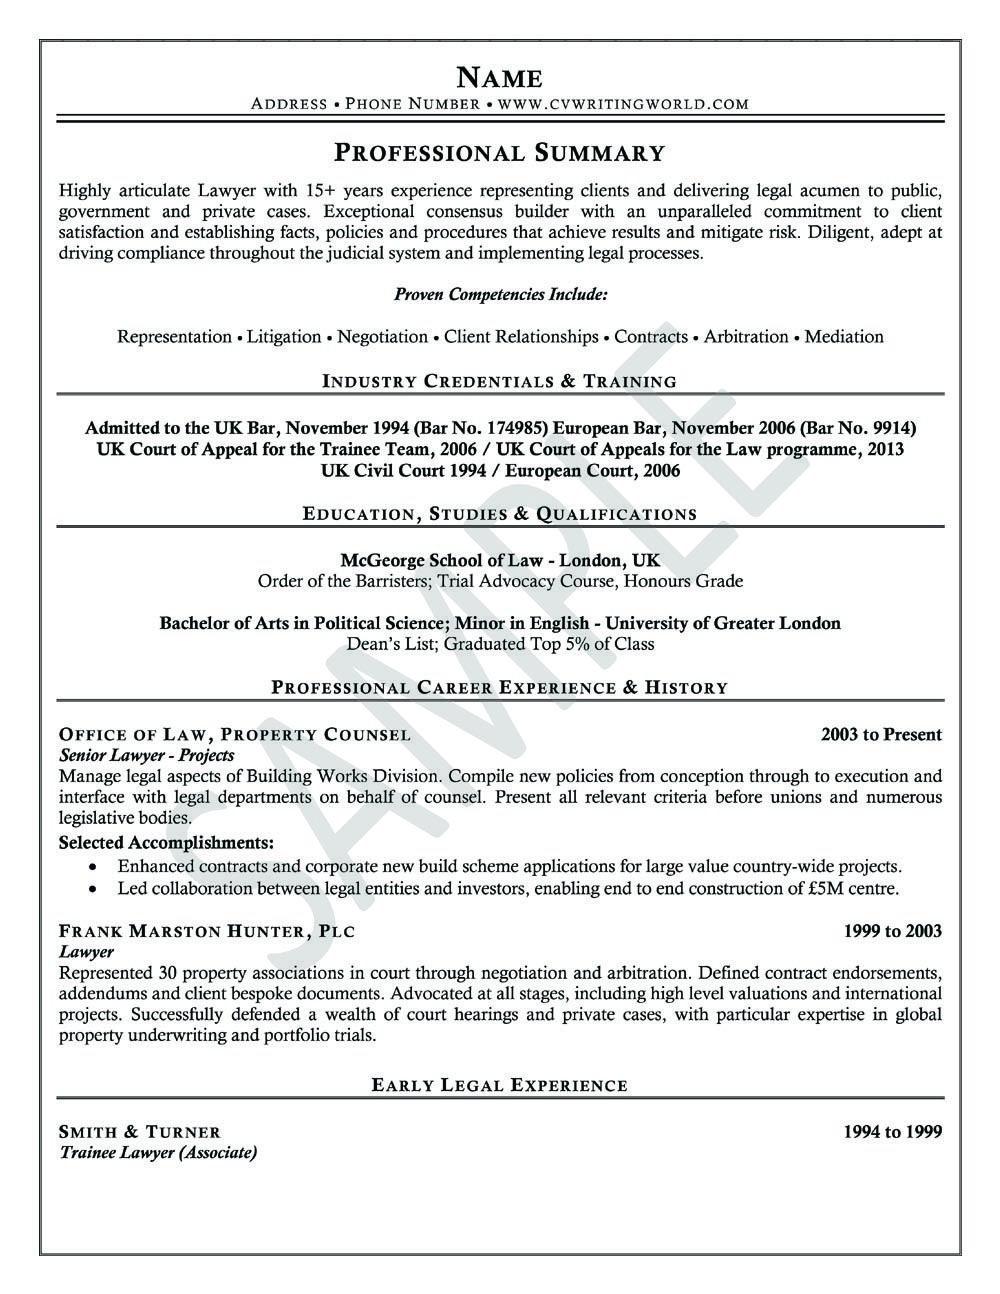 Resume Builder Austin In 2020 Resume Template Professional